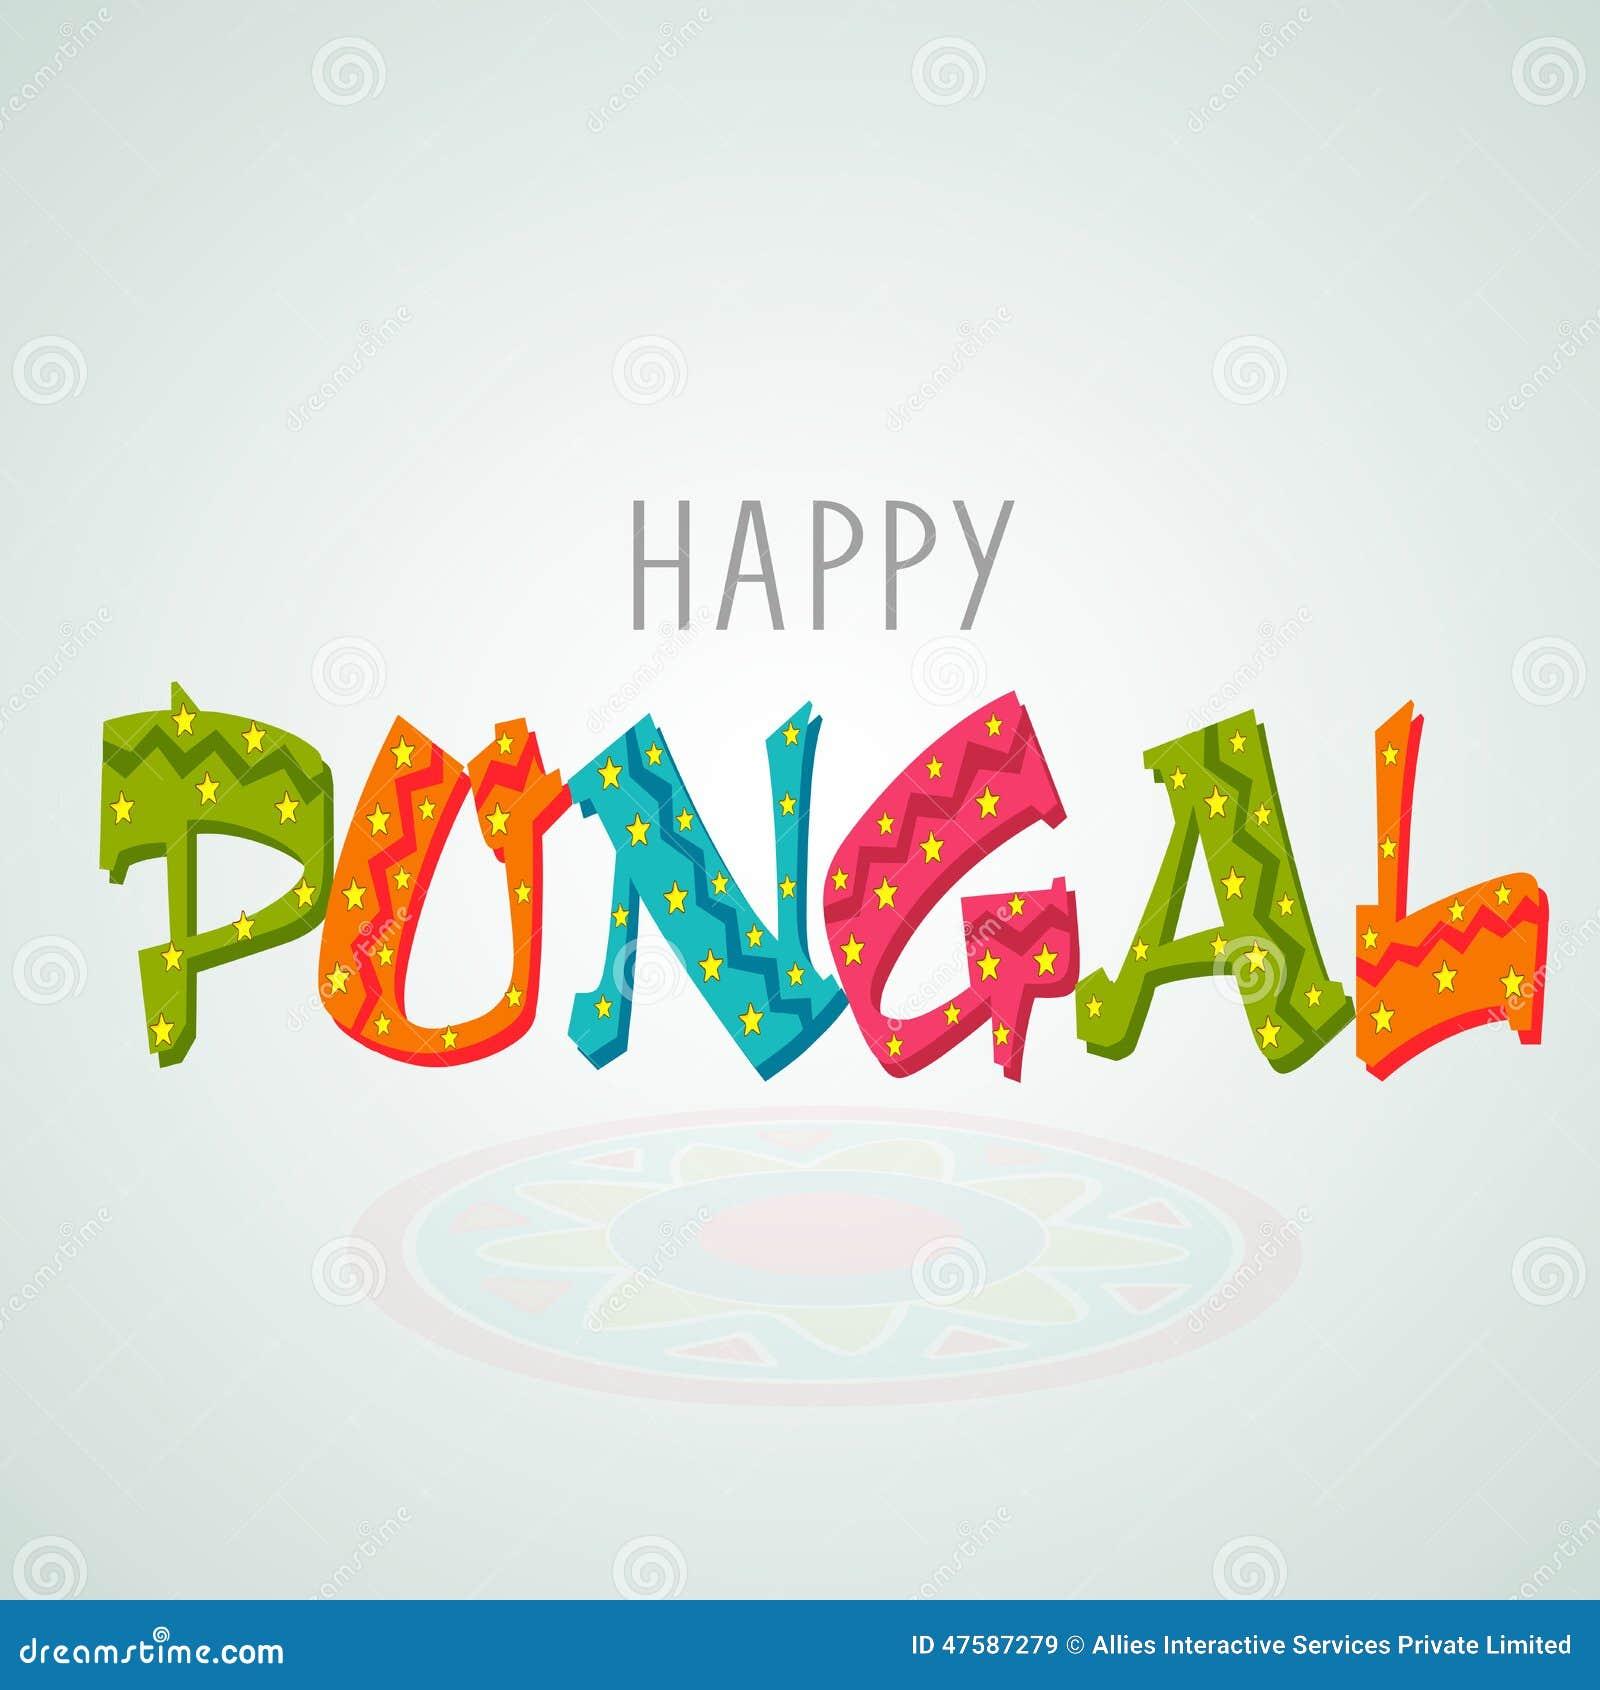 Poster or banner design for happy pongal festival - Text banner design ...